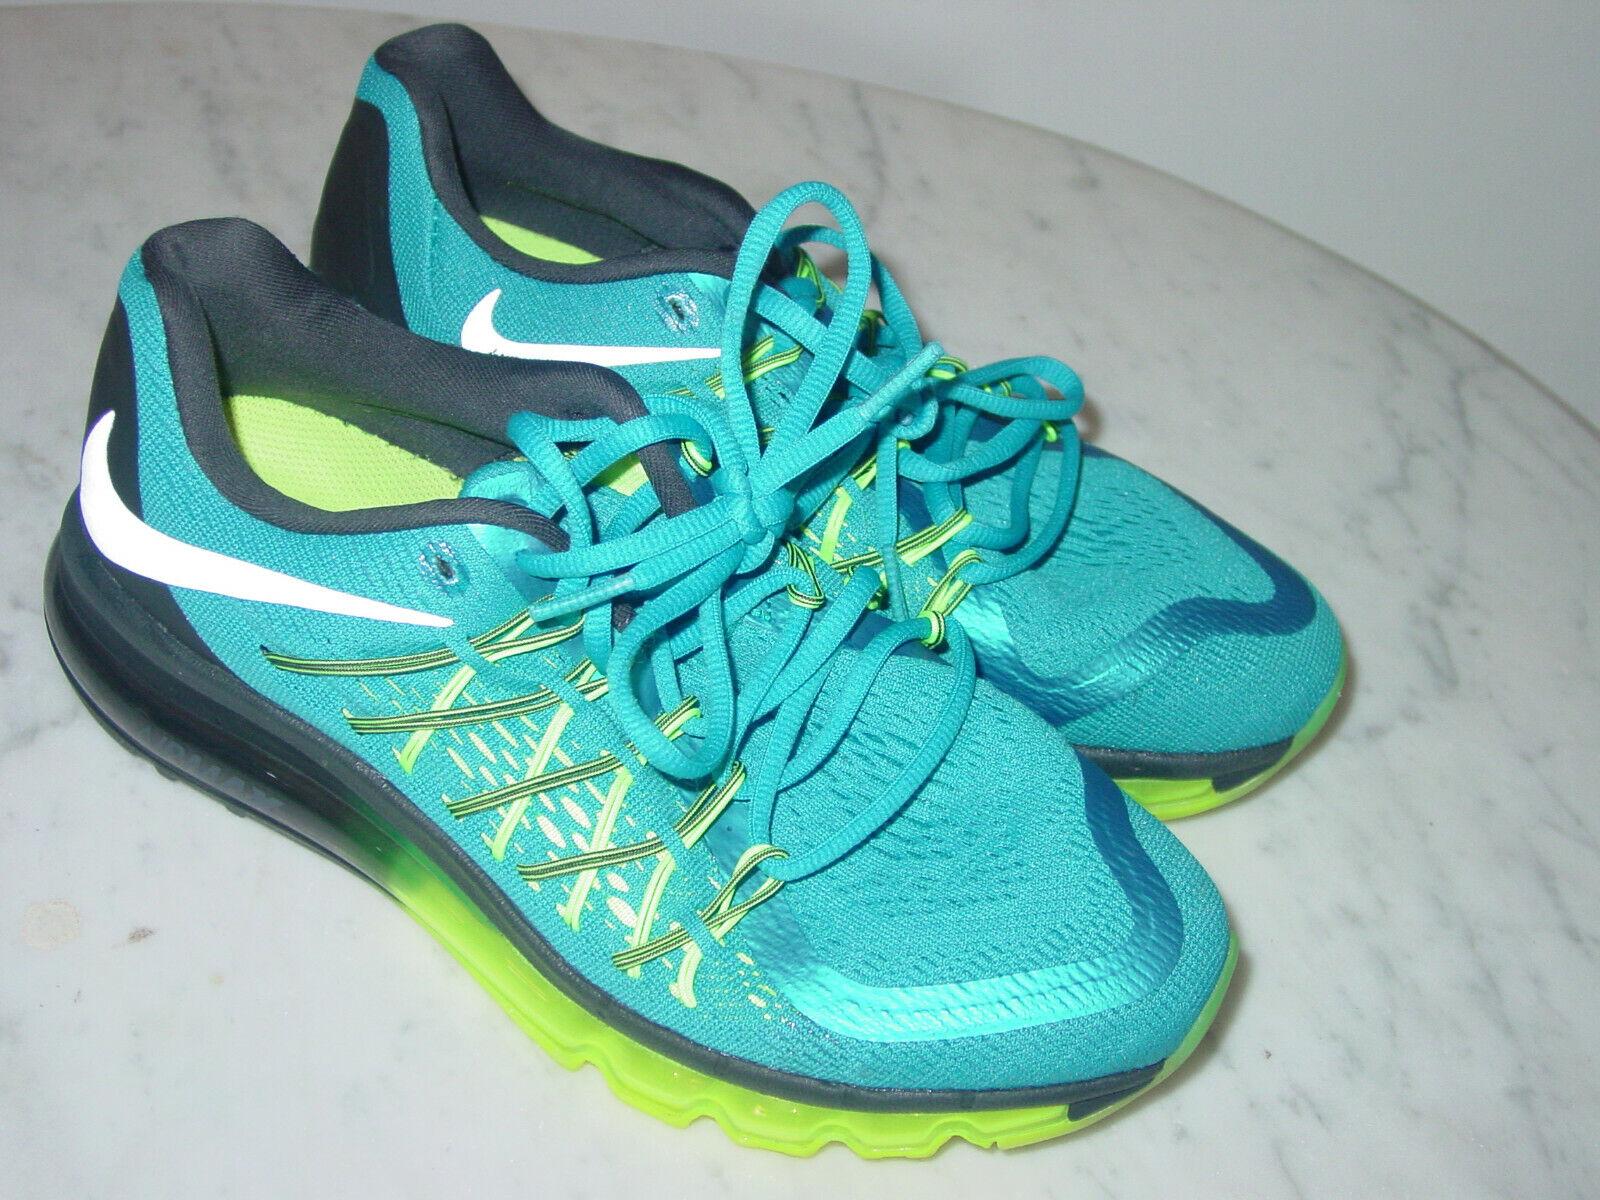 2015 Nike Air Max 2015 Lacquer Blu  Volt   Anthracite Running scarpe Dimensione 7.5  esclusivo